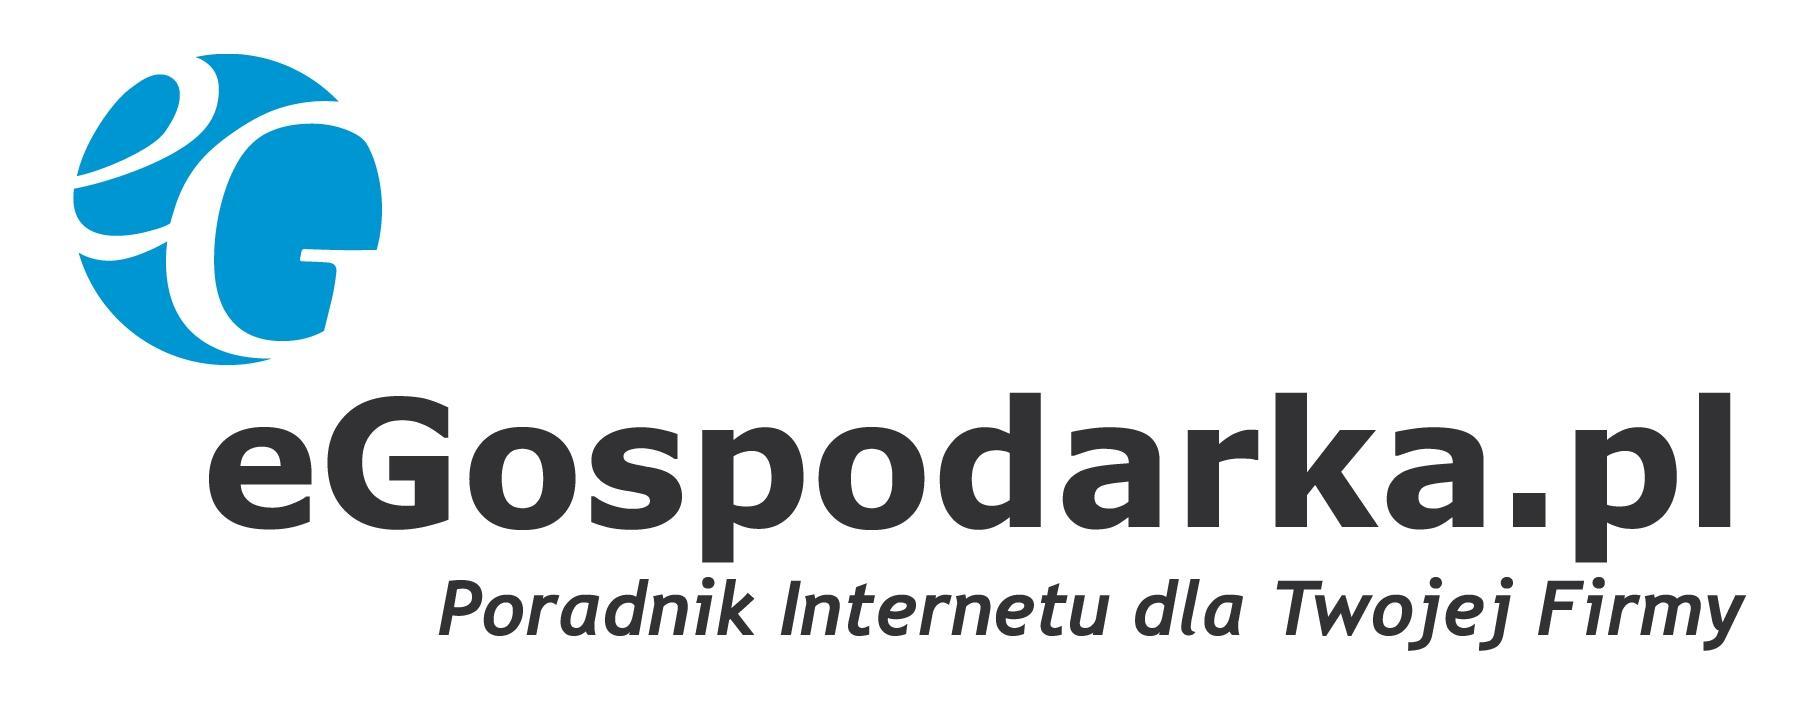 inc50